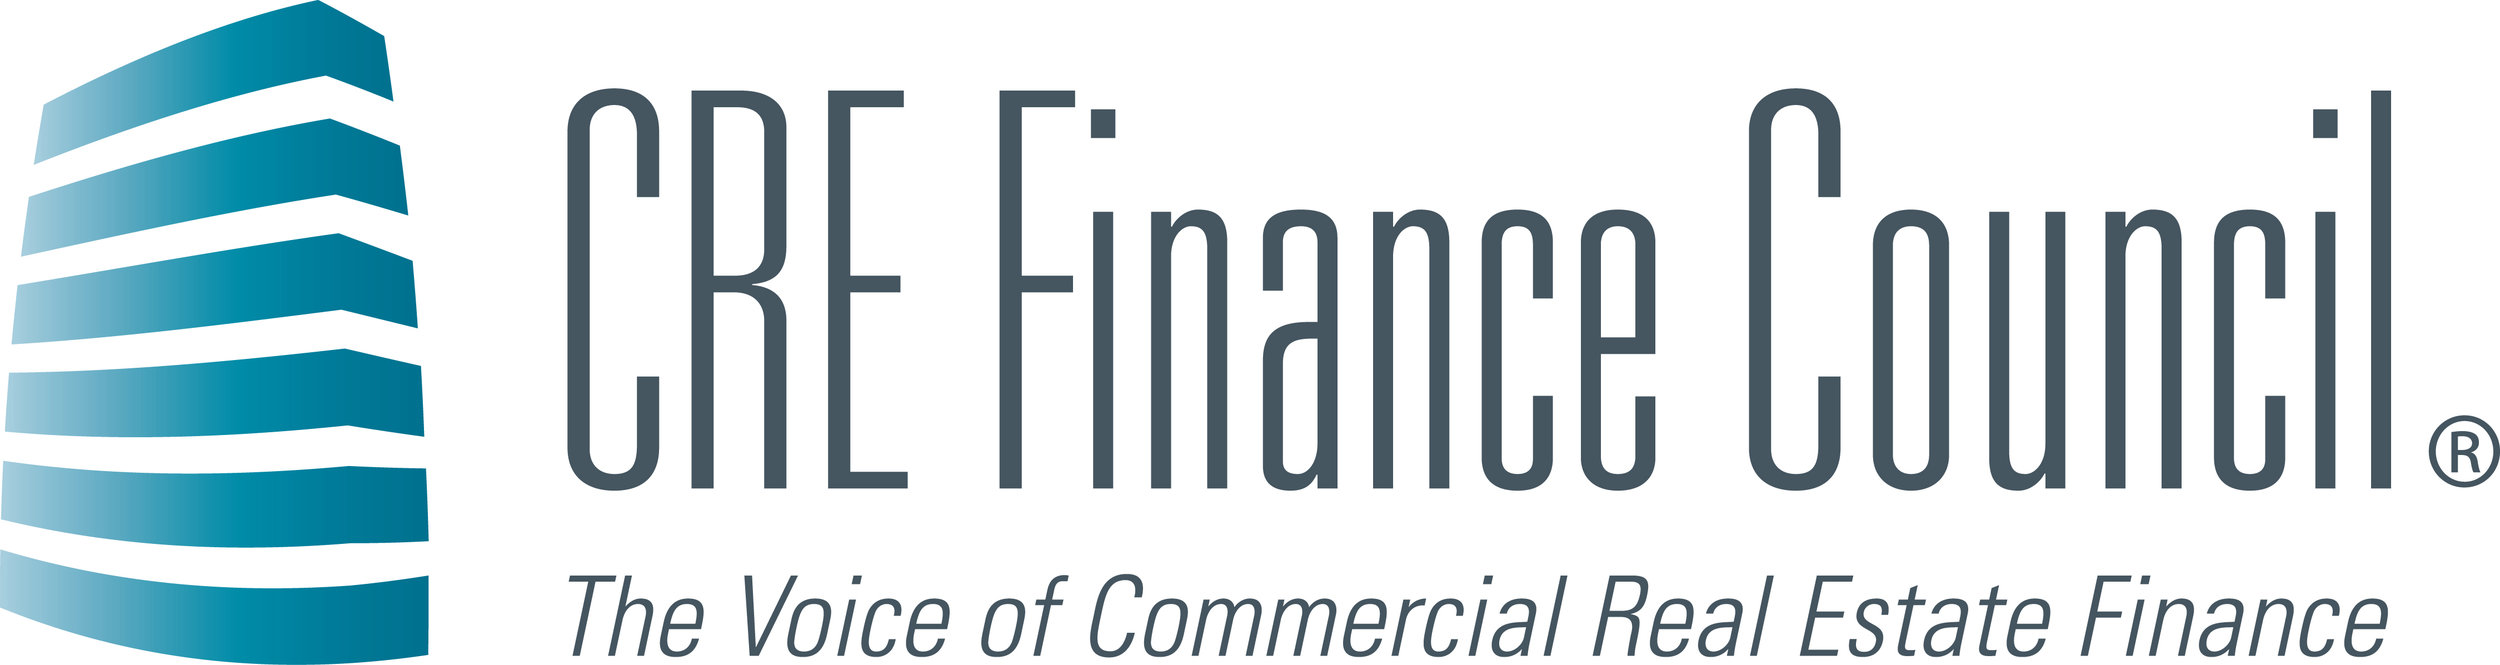 CRE Finance Council - Logo.jpg